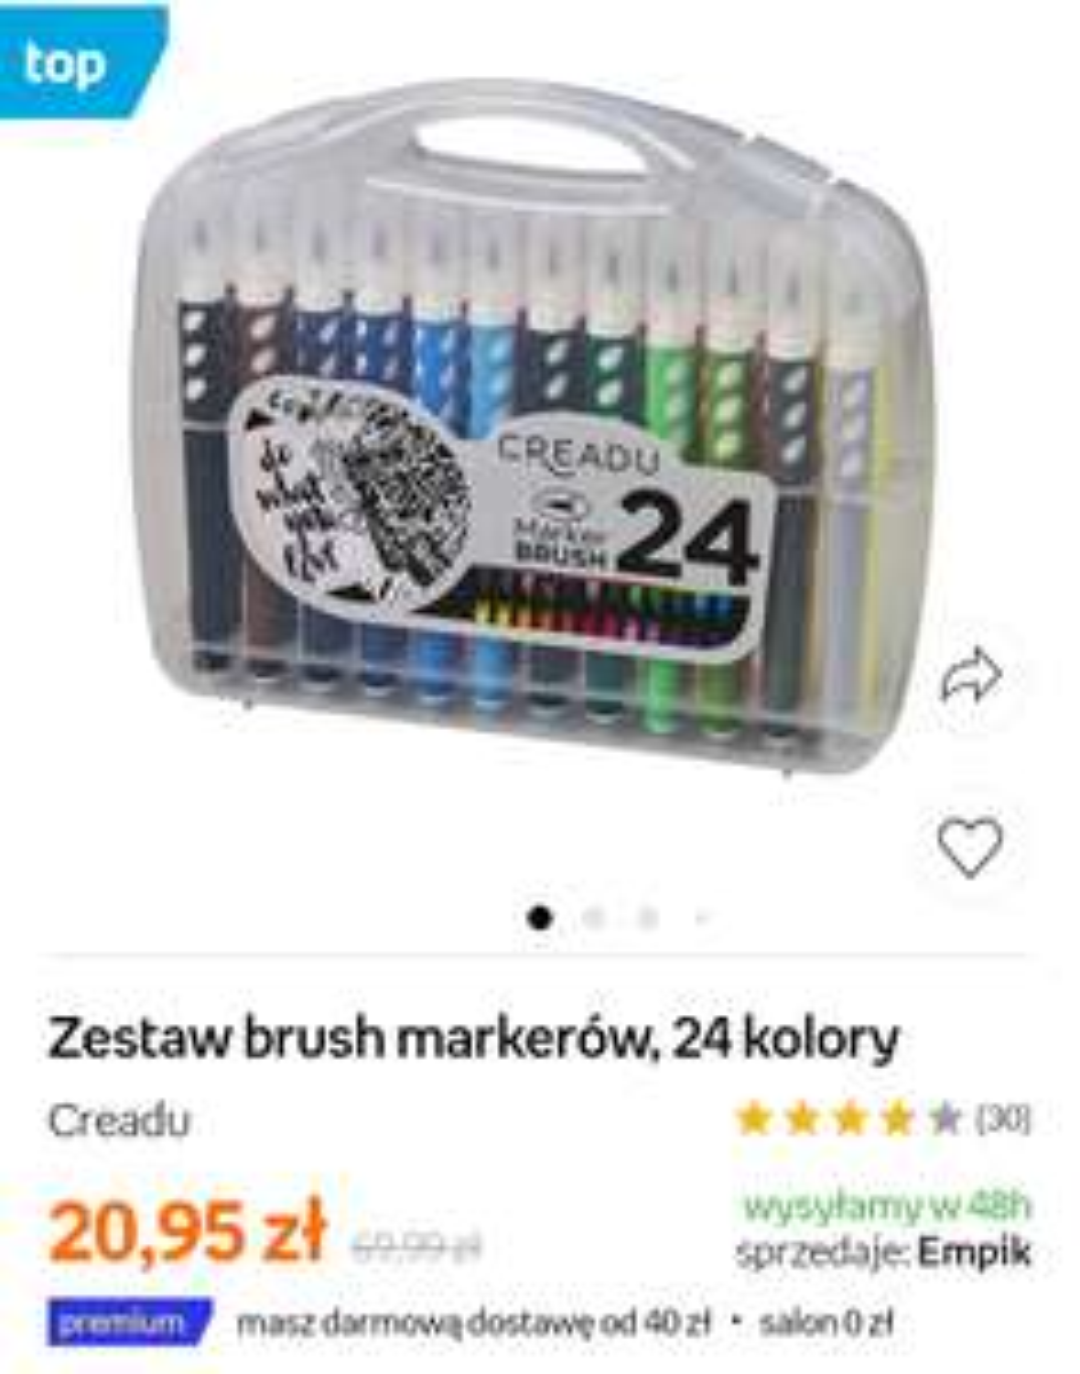 Zestaw Brush Markerów Creadu 24 Kolory @Empik